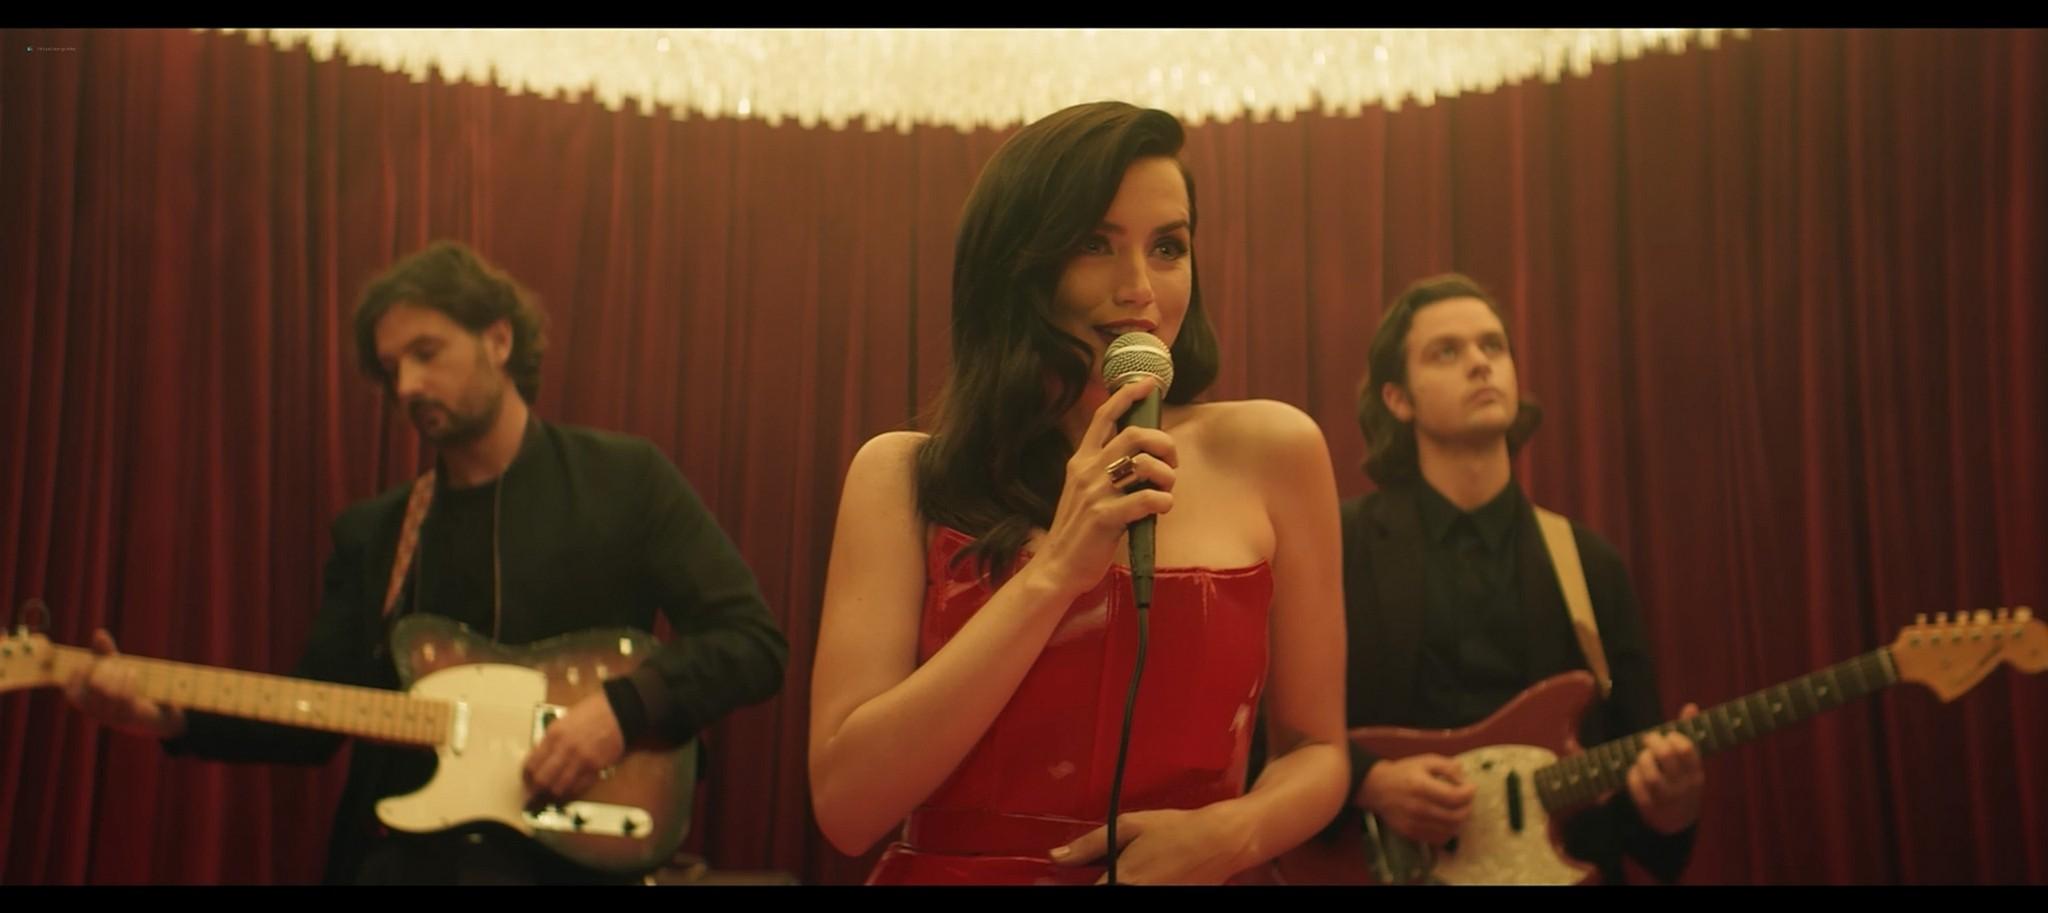 Ana de Armas hot and sexy Entering Red 2019 1080p Web 15